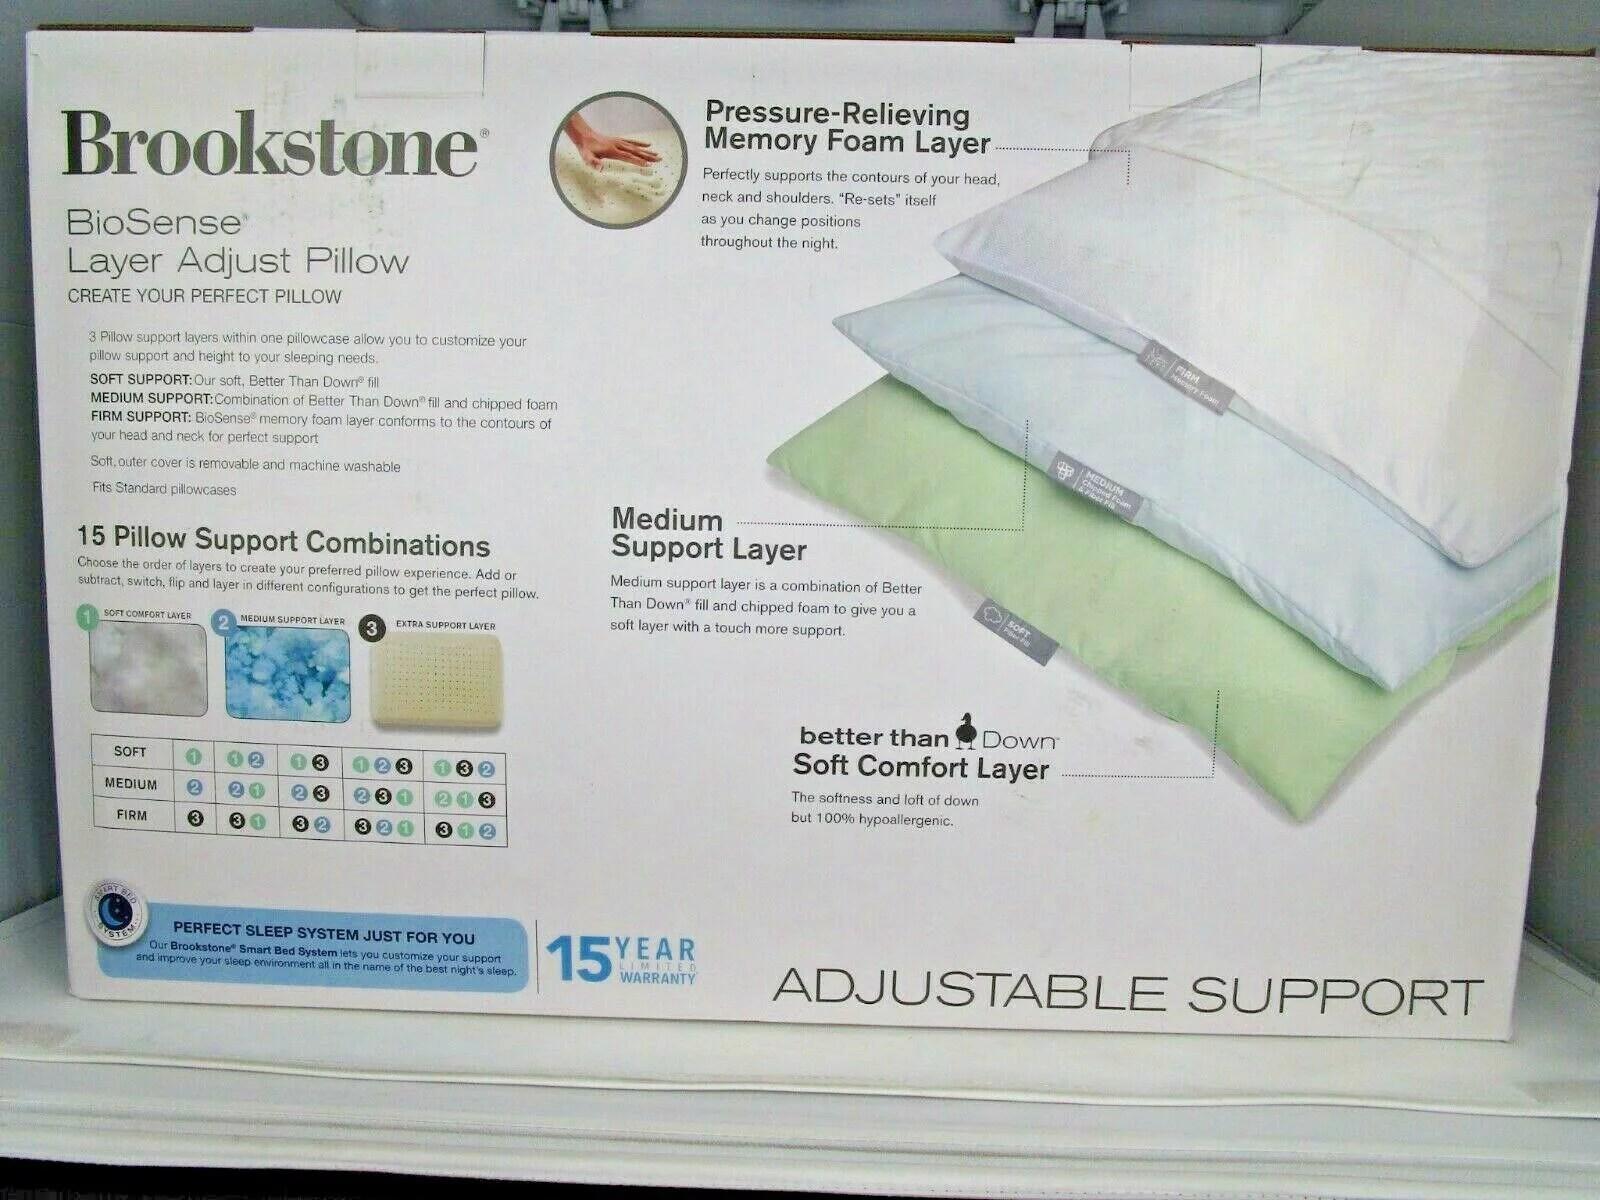 brookstone biosense layer adjust standard queen memory foam pillow 18 x 26 in